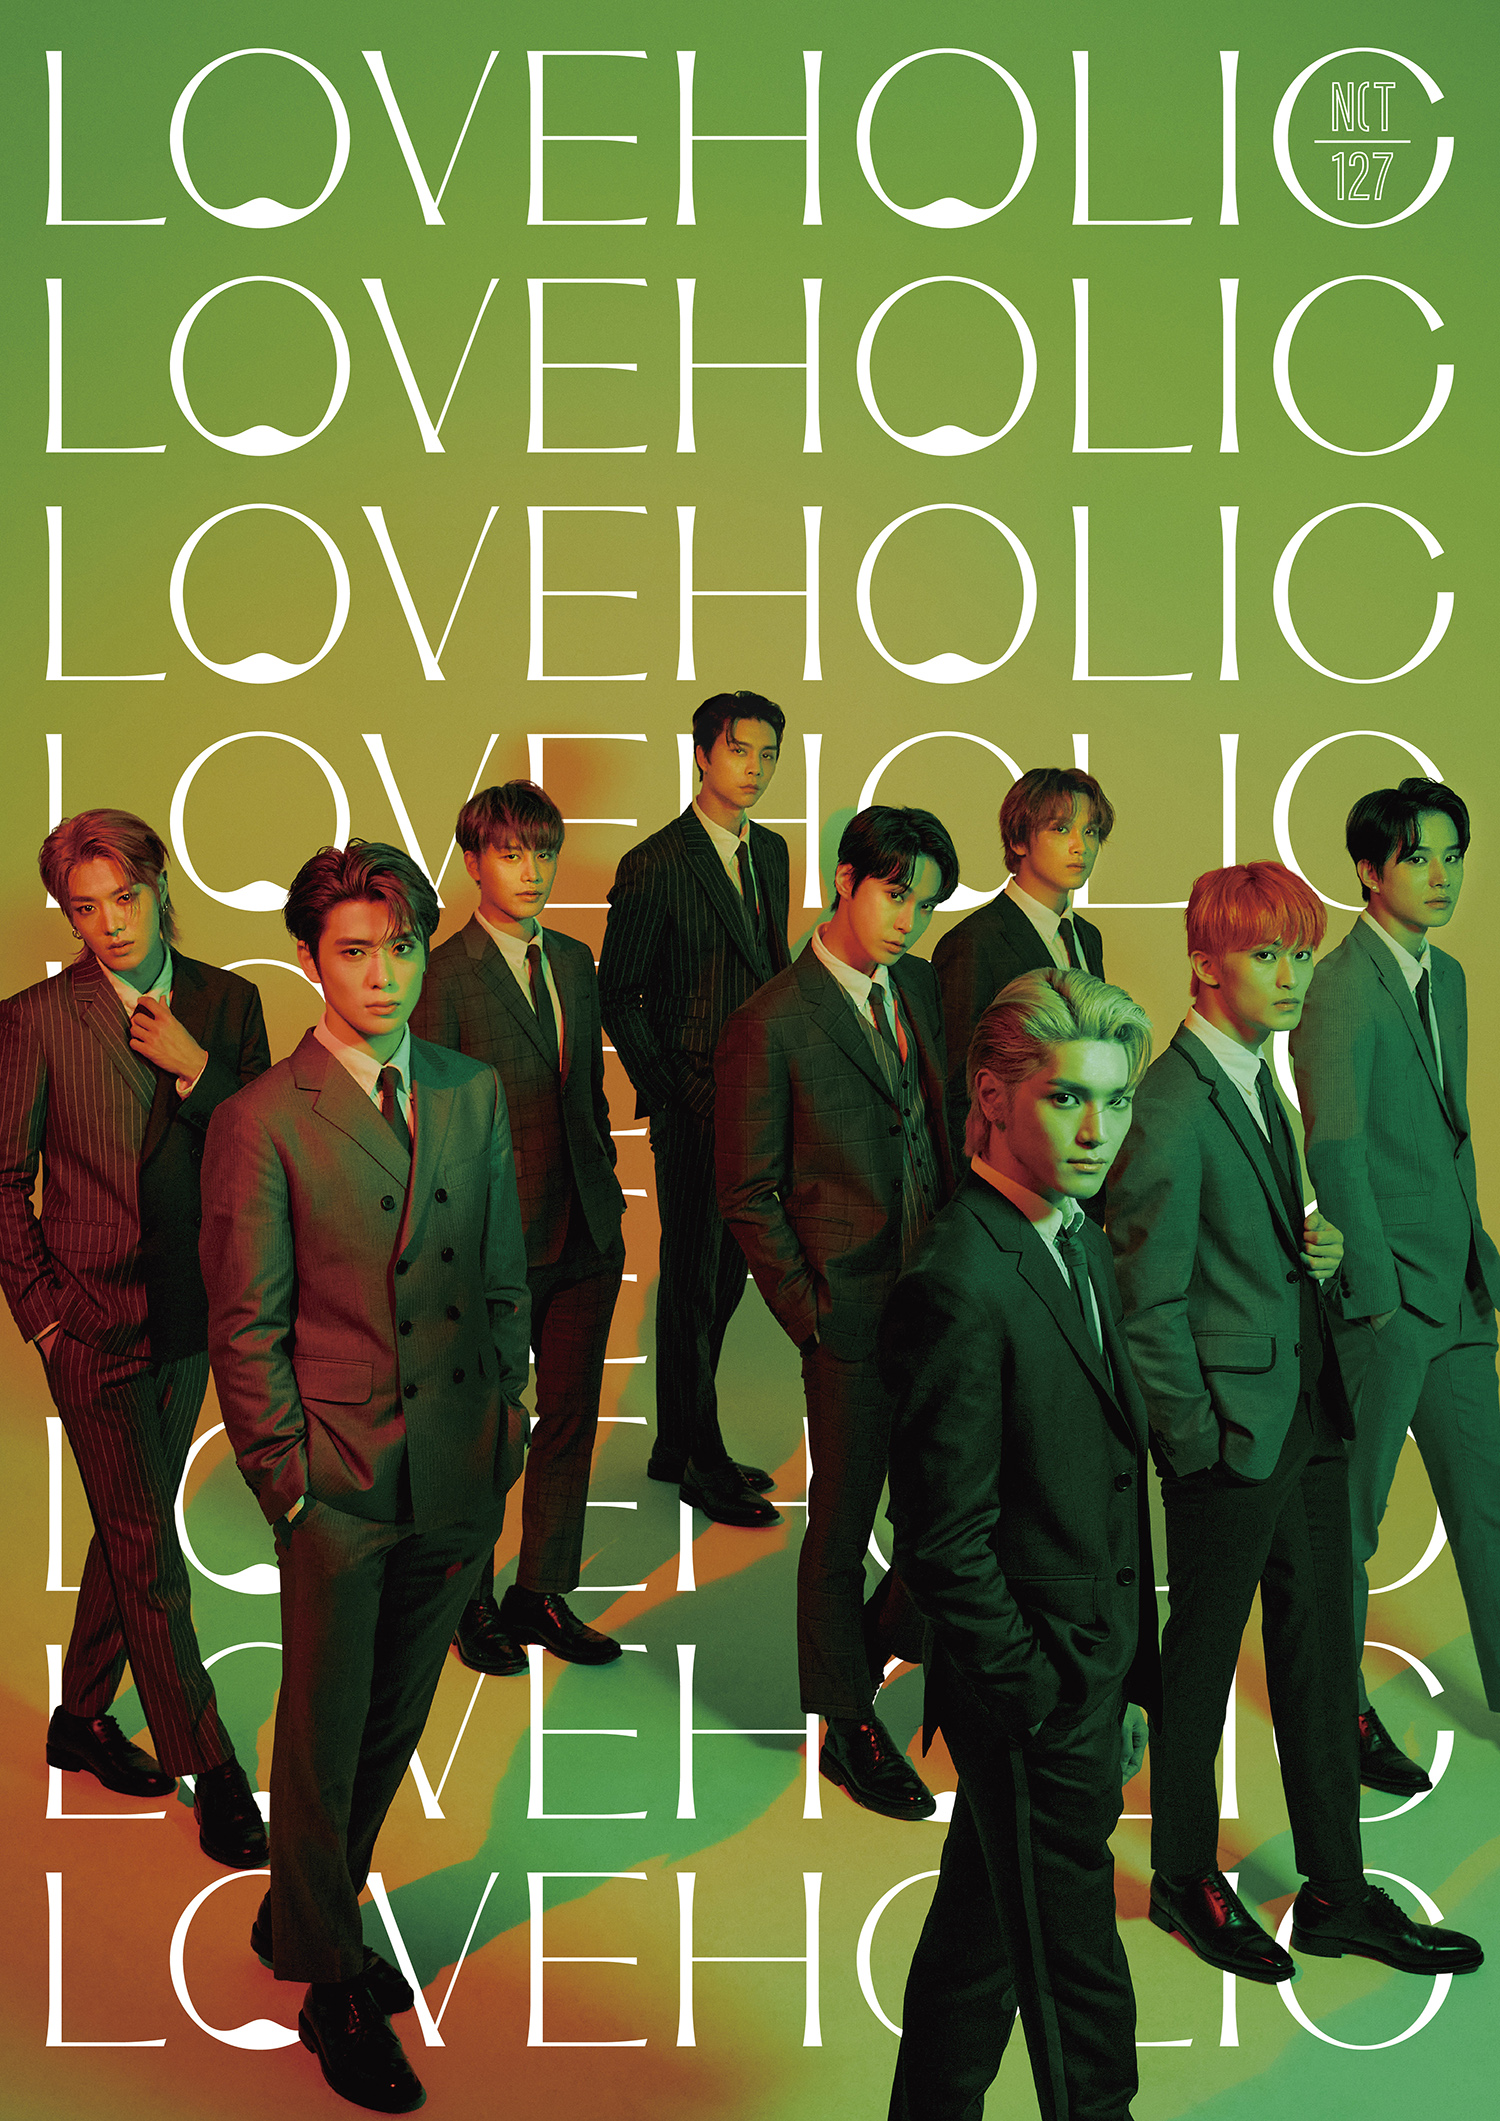 NCT 127第二张日本迷你专辑《LOVEHOLIC》图片 2.jpg